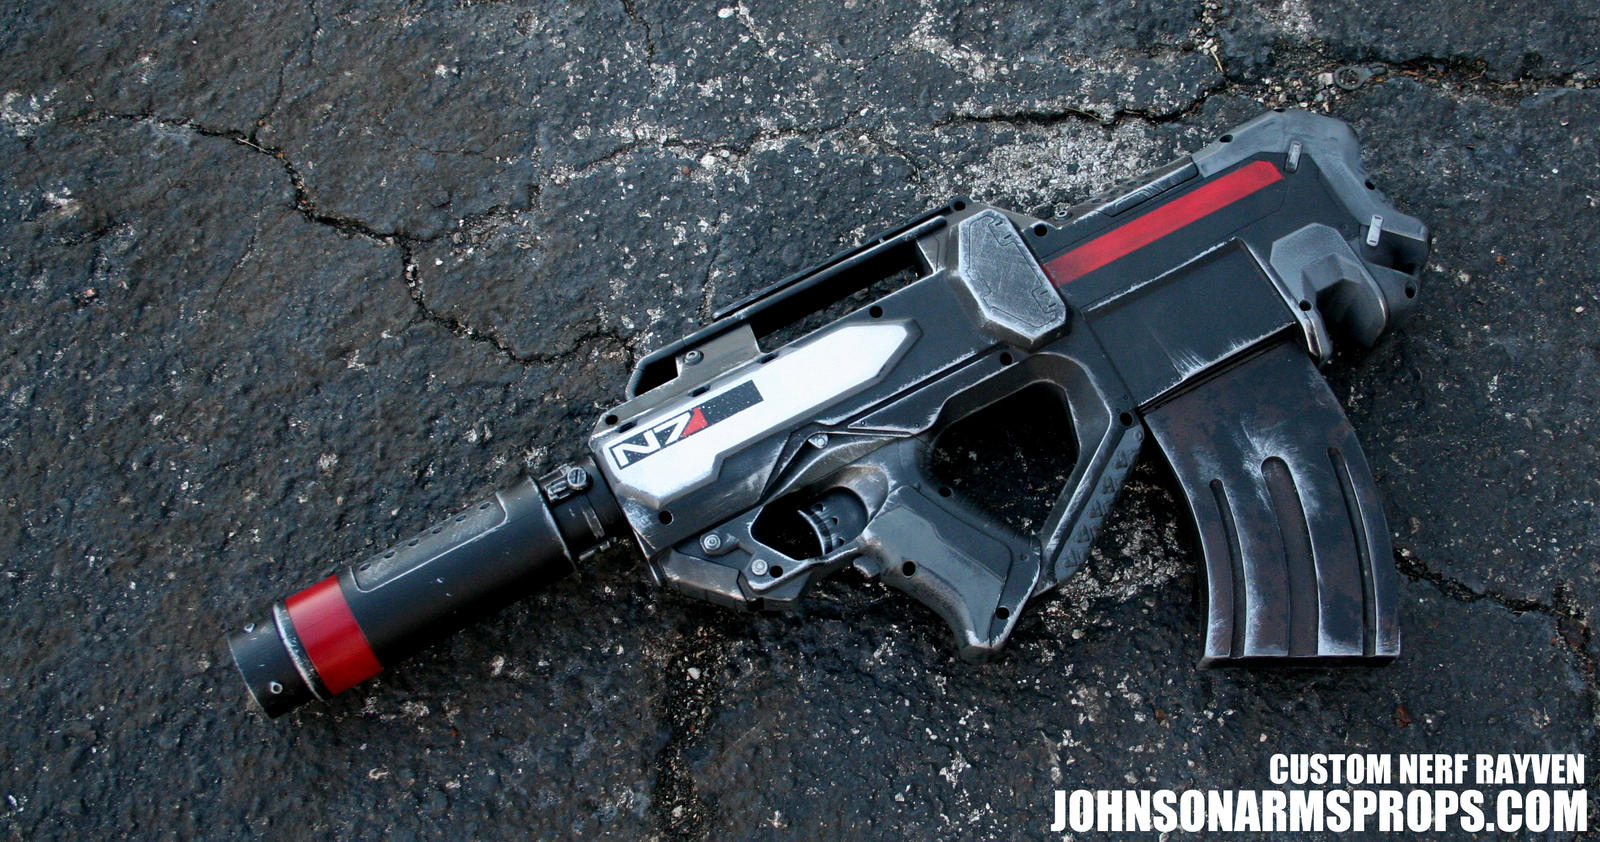 Mass Effect 3 Themed Nerf Elite Rayven by JohnsonArms